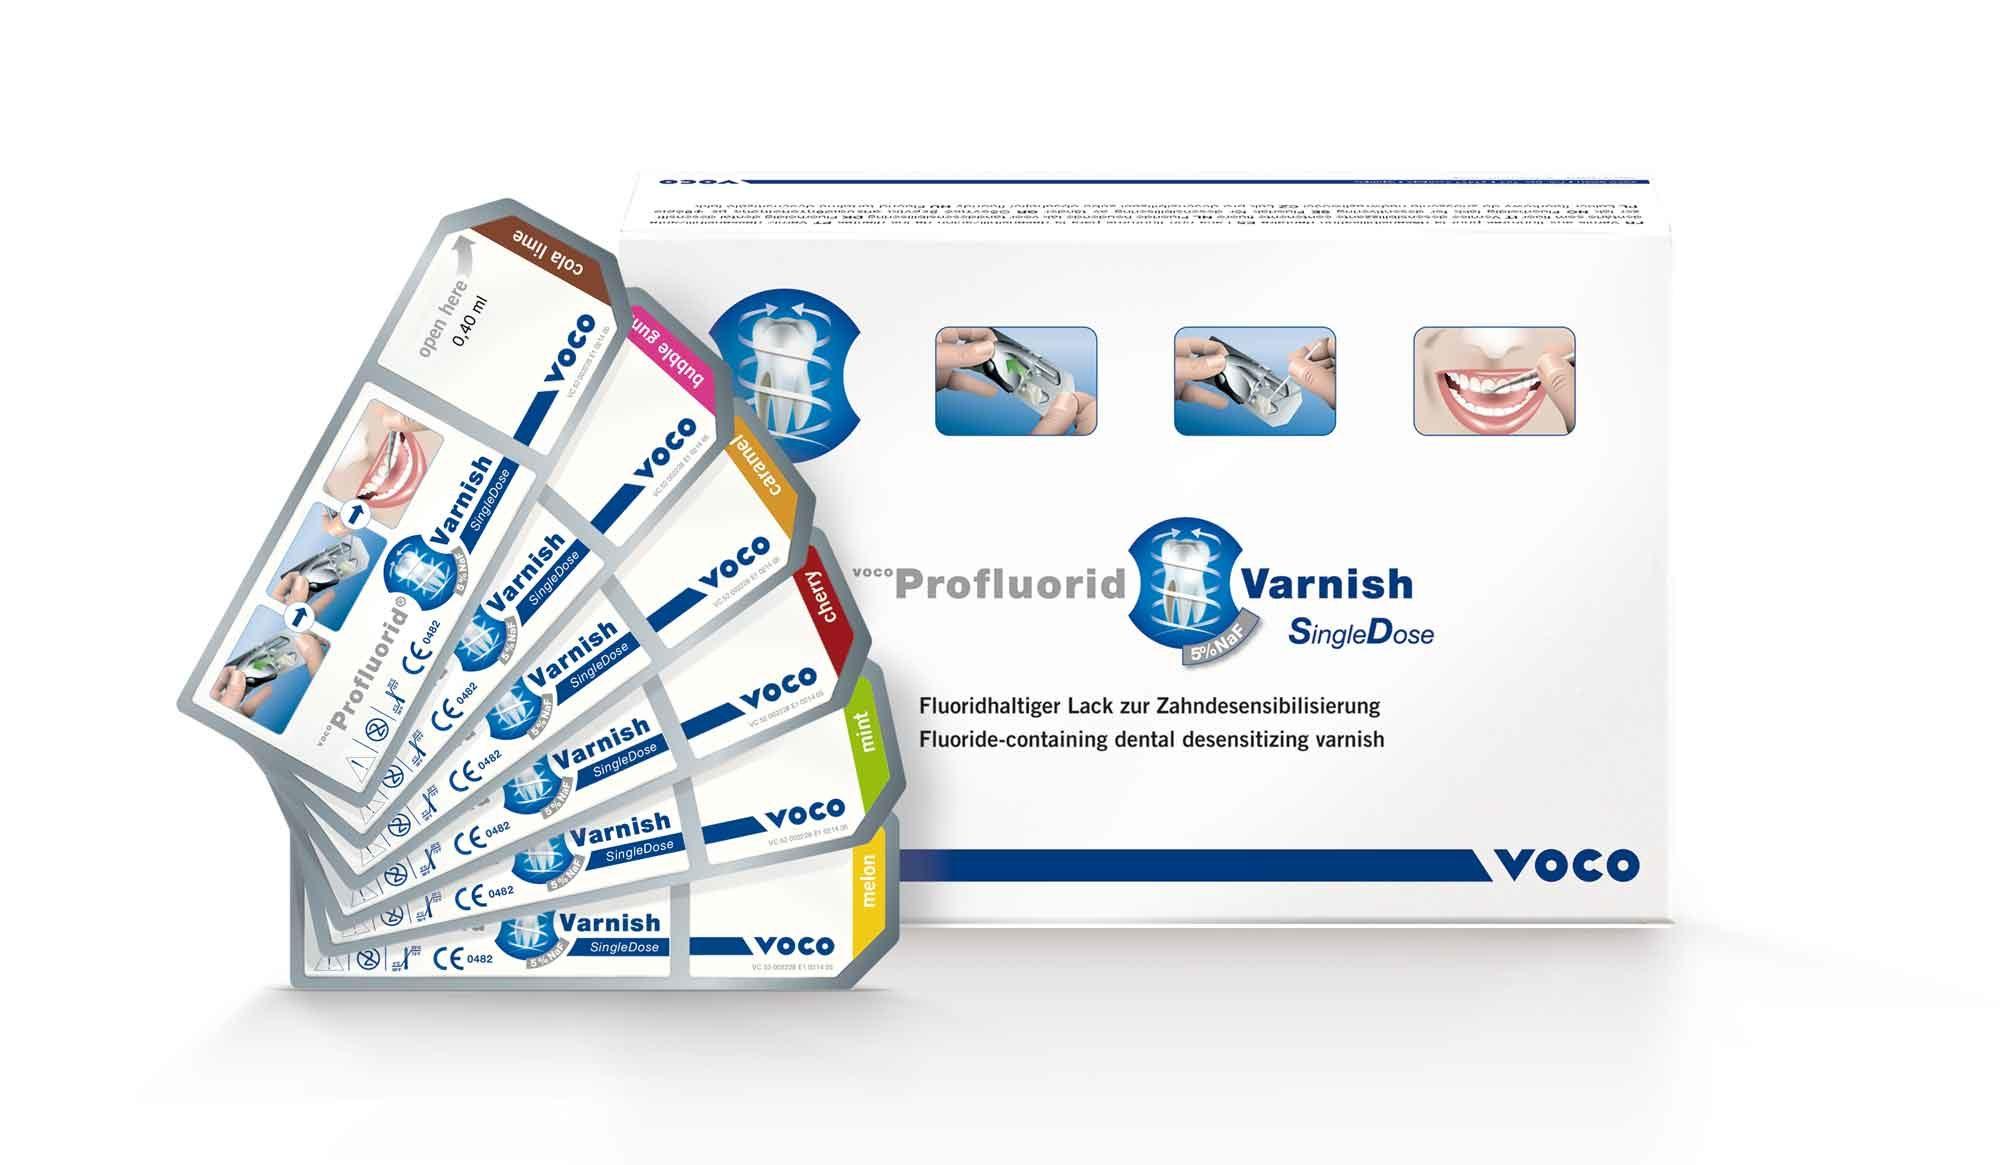 Voco Profluoride Varnish